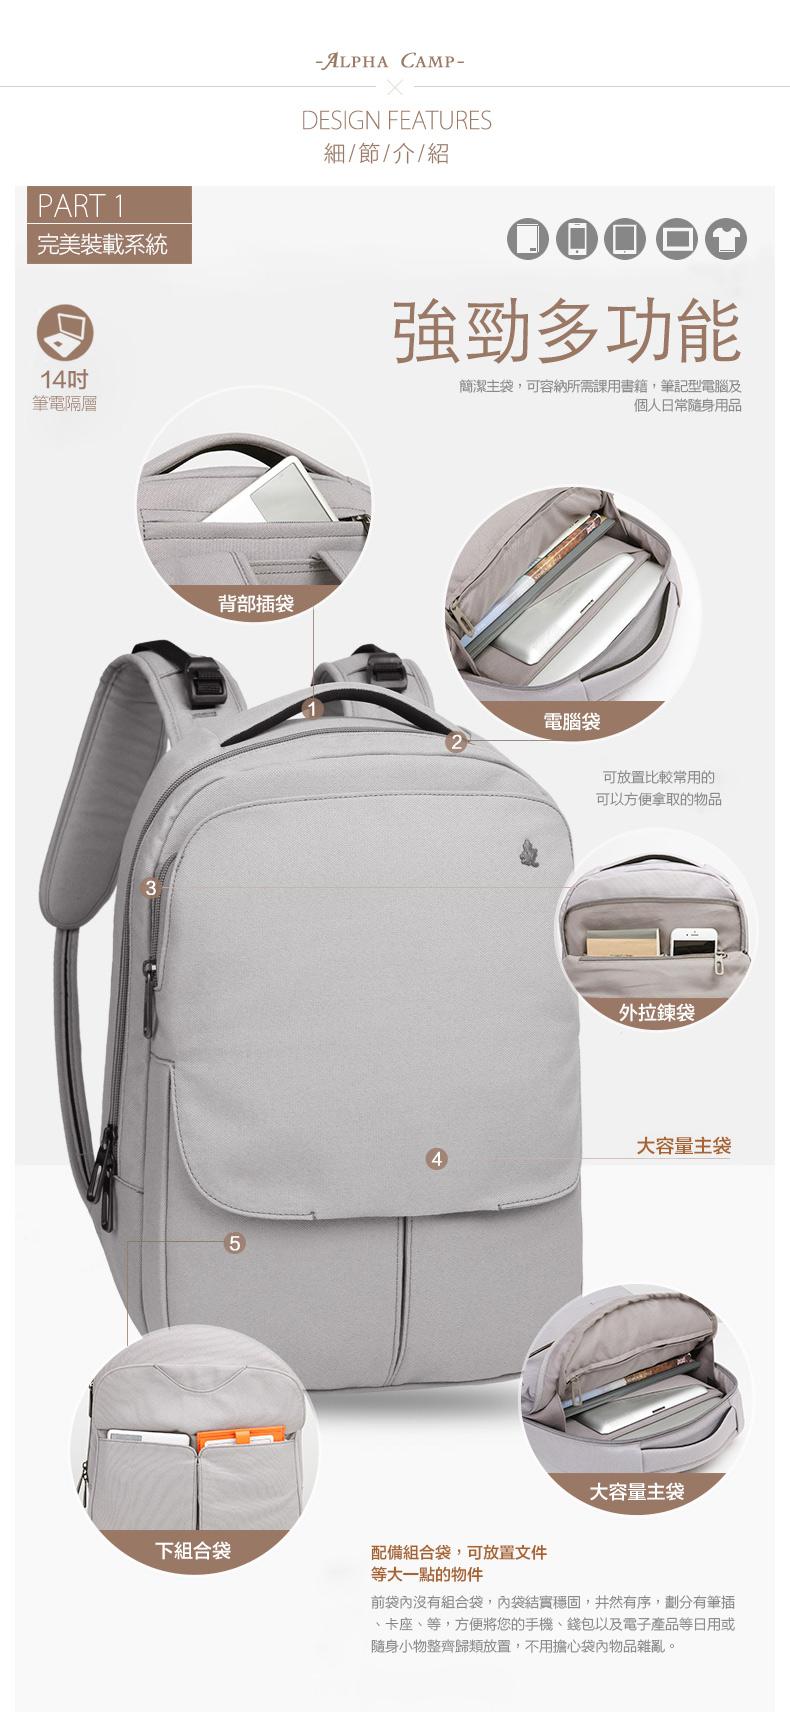 HK-08785-1_04